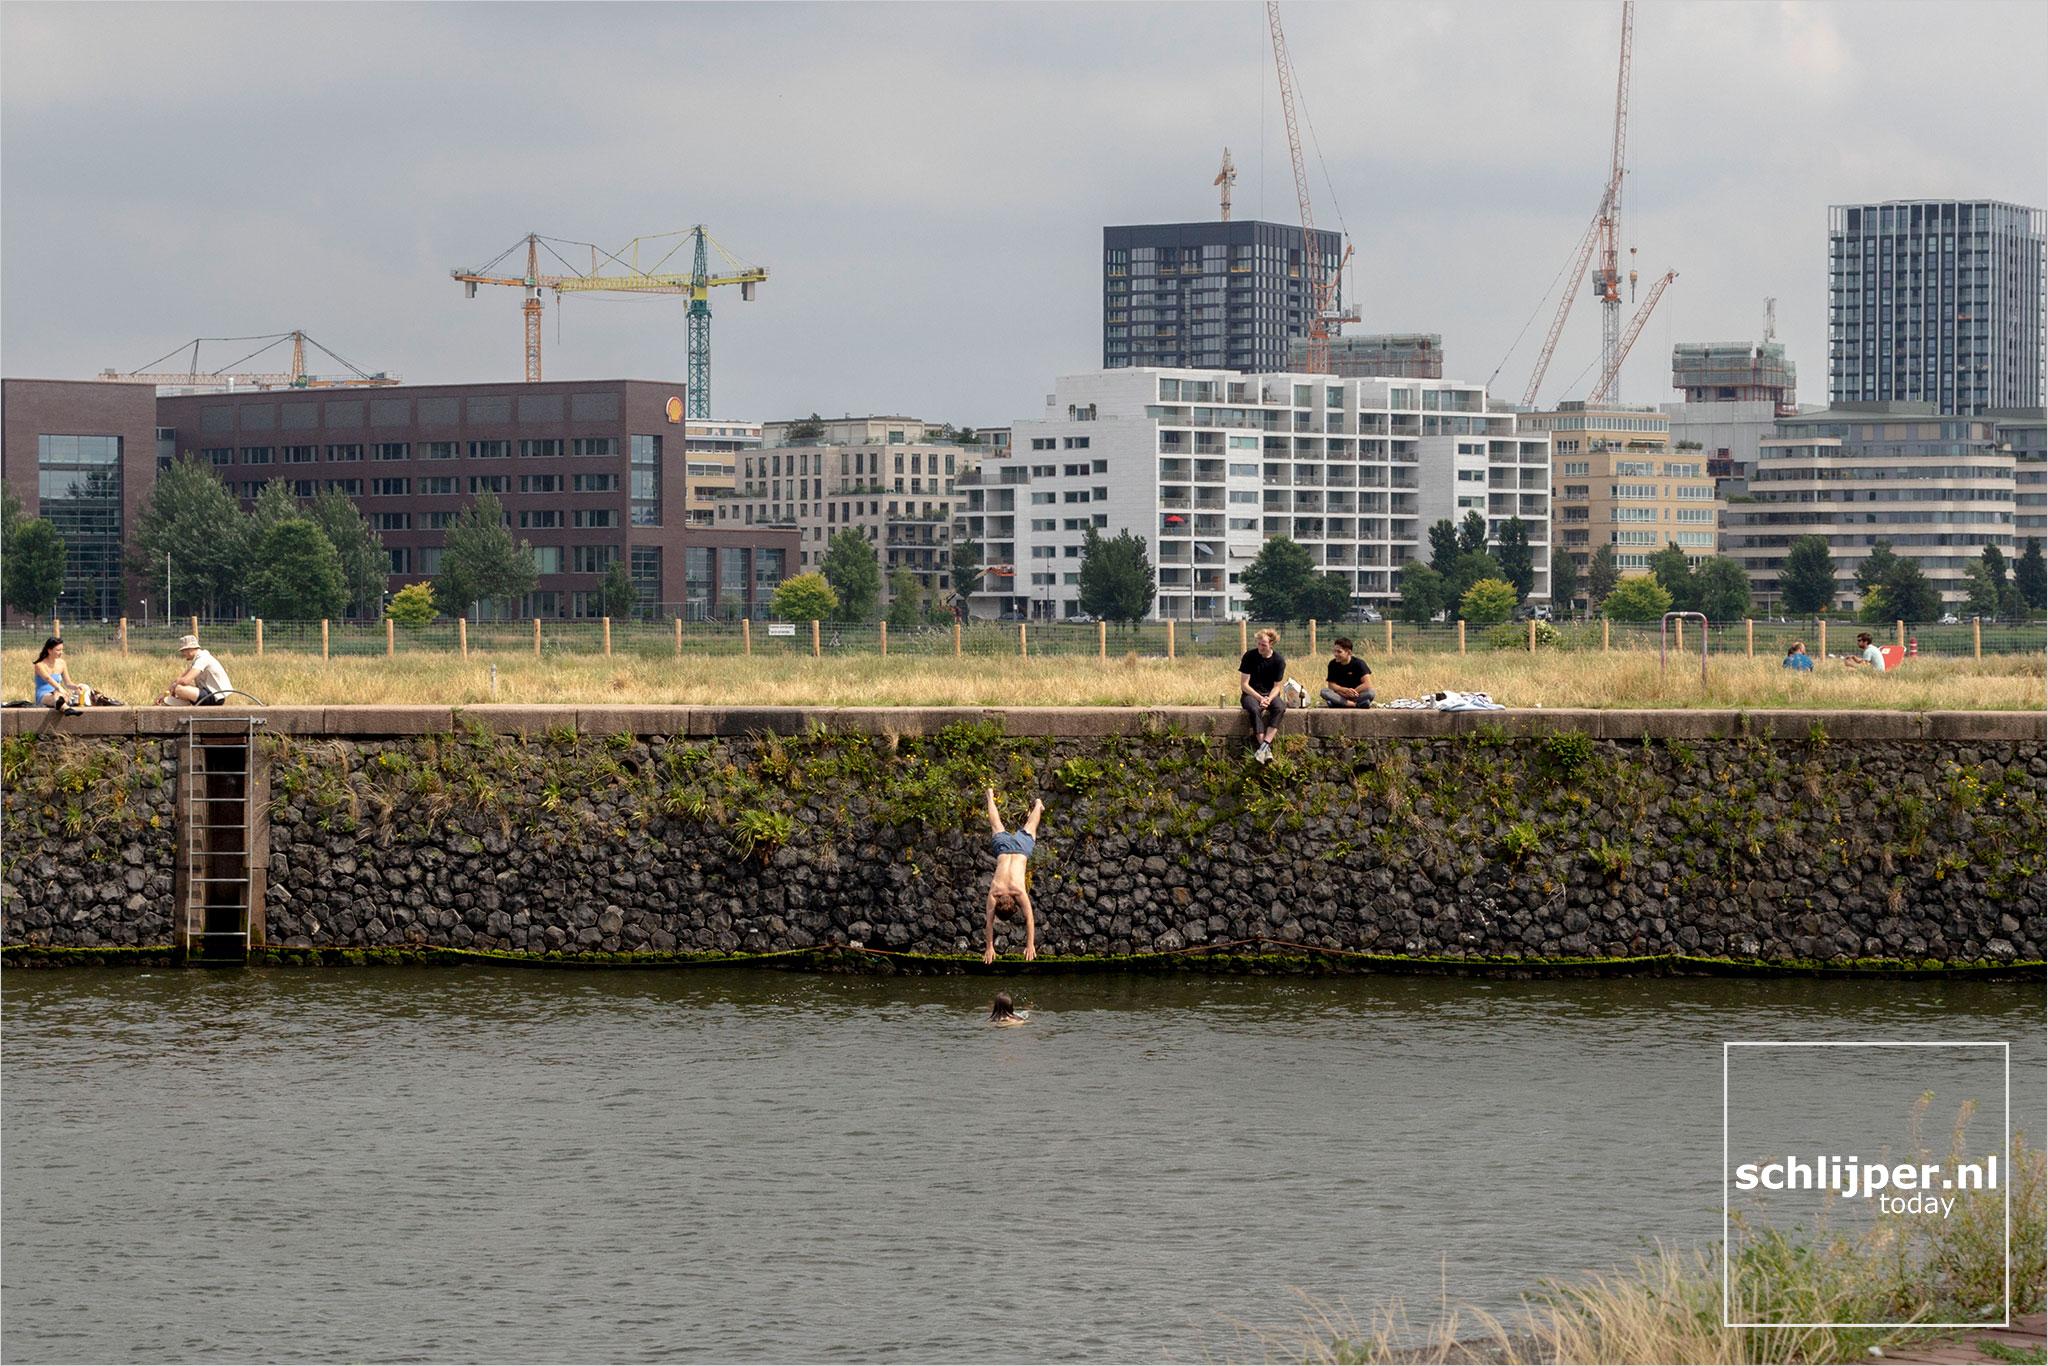 The Netherlands, Amsterdam, 9 juli 2021